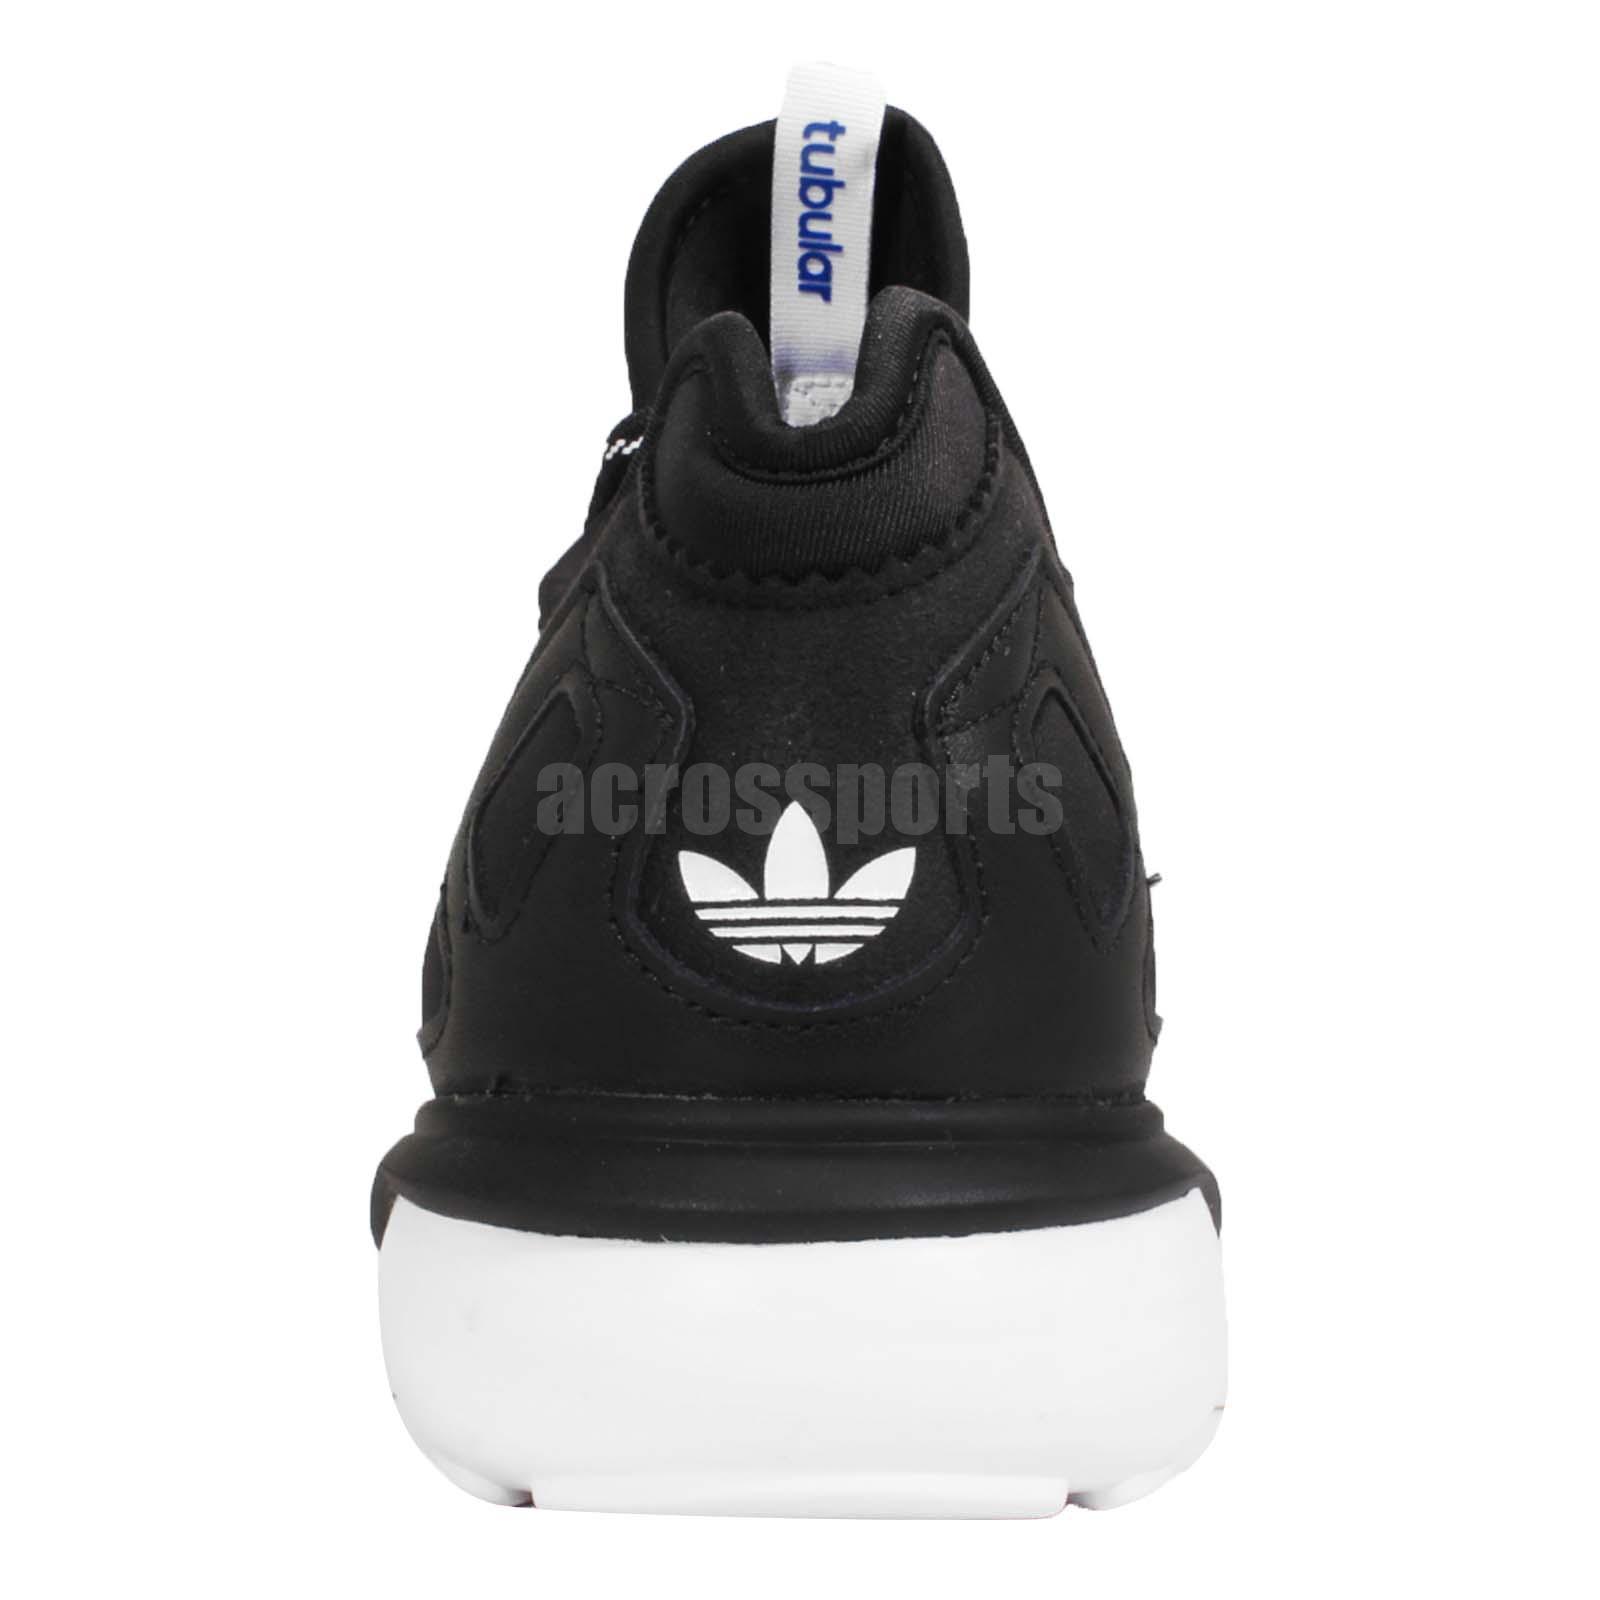 online retailer 92a04 9e7ca adidas Originals Tubular Runner Black Mens Running Shoes Sneakers Y3 ...